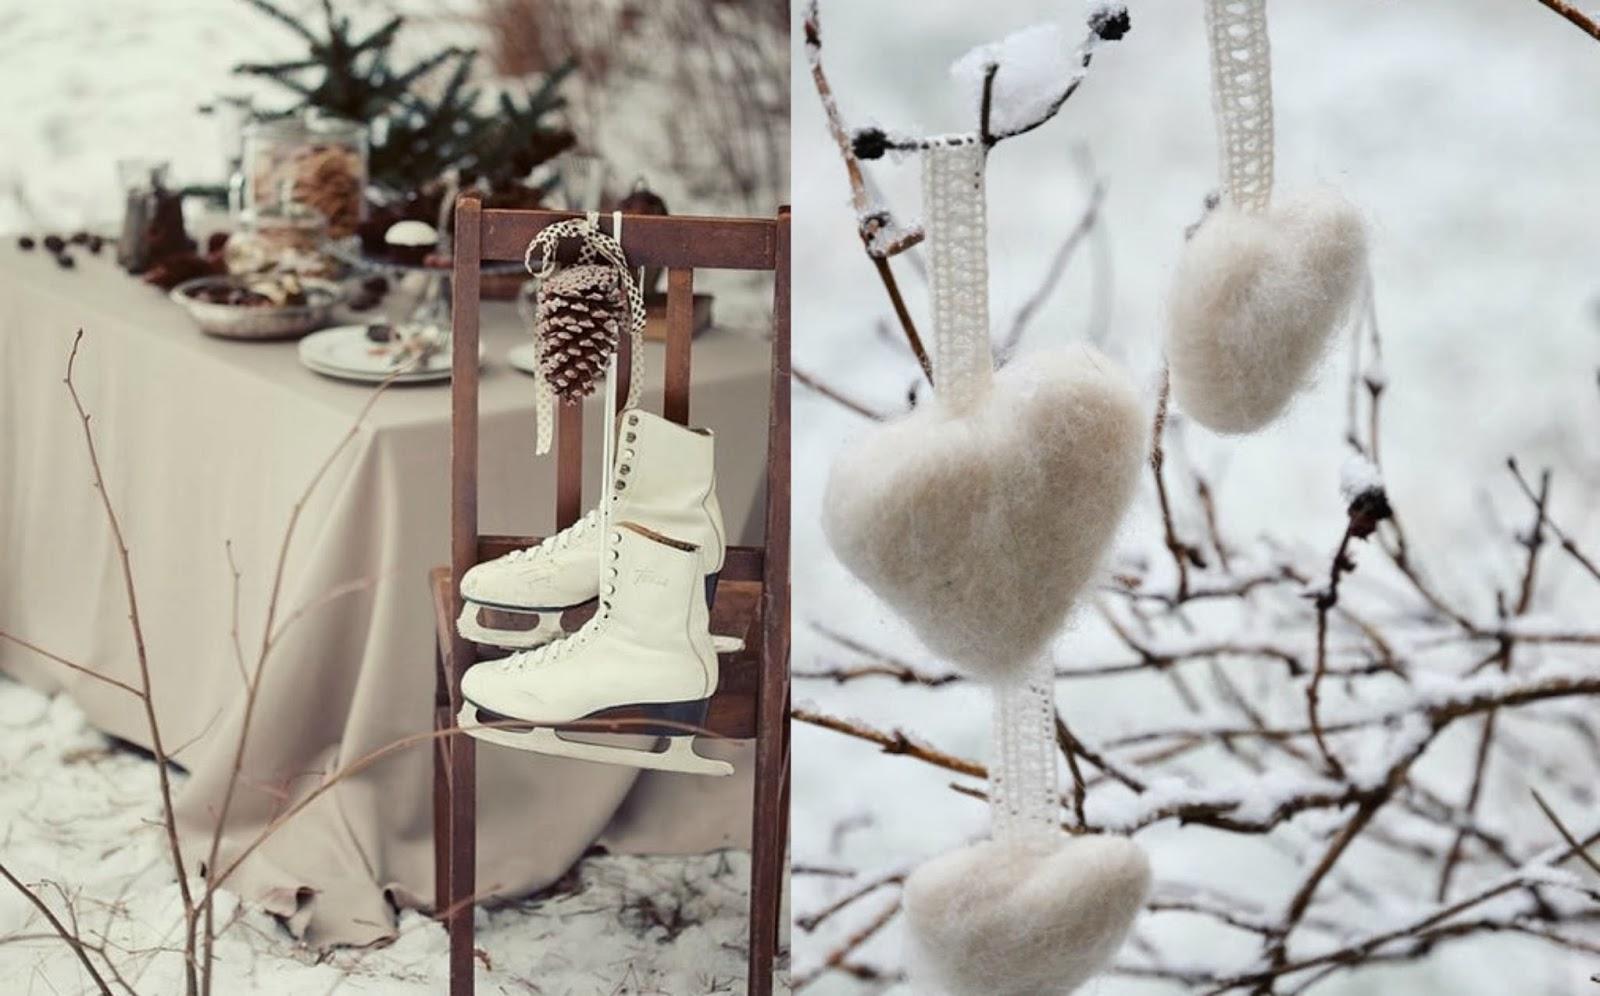 zimno i snieg